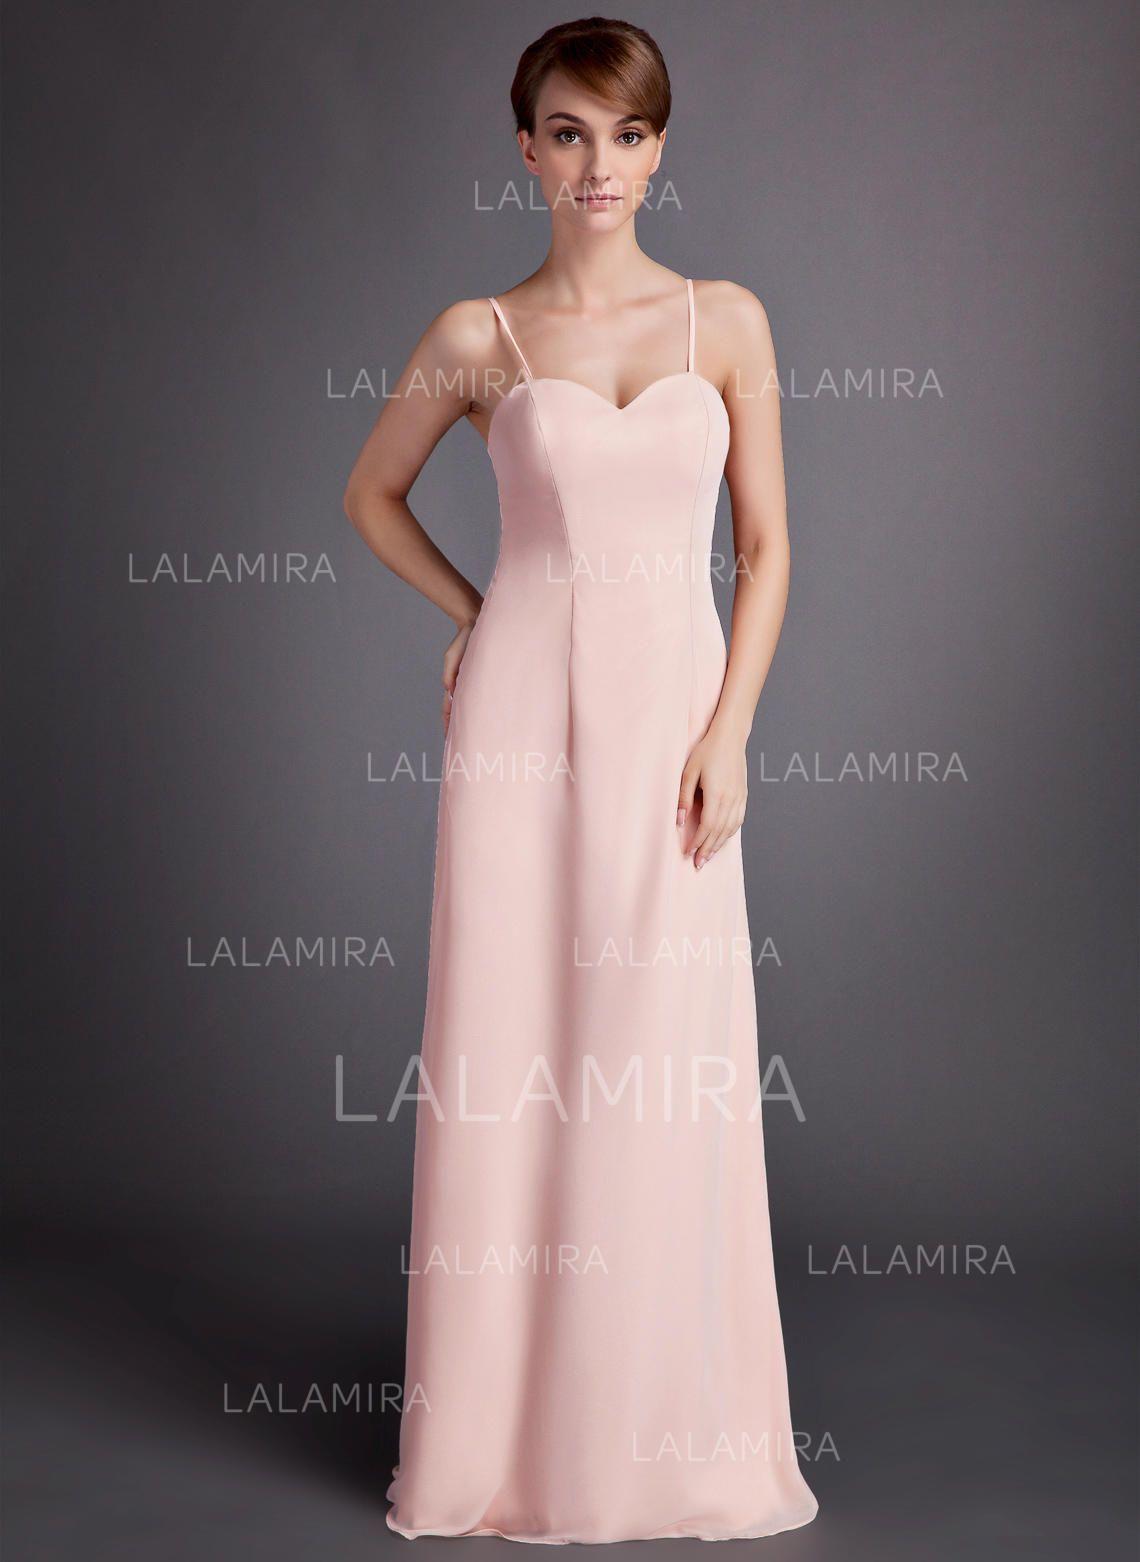 2be6c4e567 A-Line Princess Chiffon Sleeveless Sweetheart Floor-Length Zipper Up Mother  of the Bride Dresses  211191 - lalamira